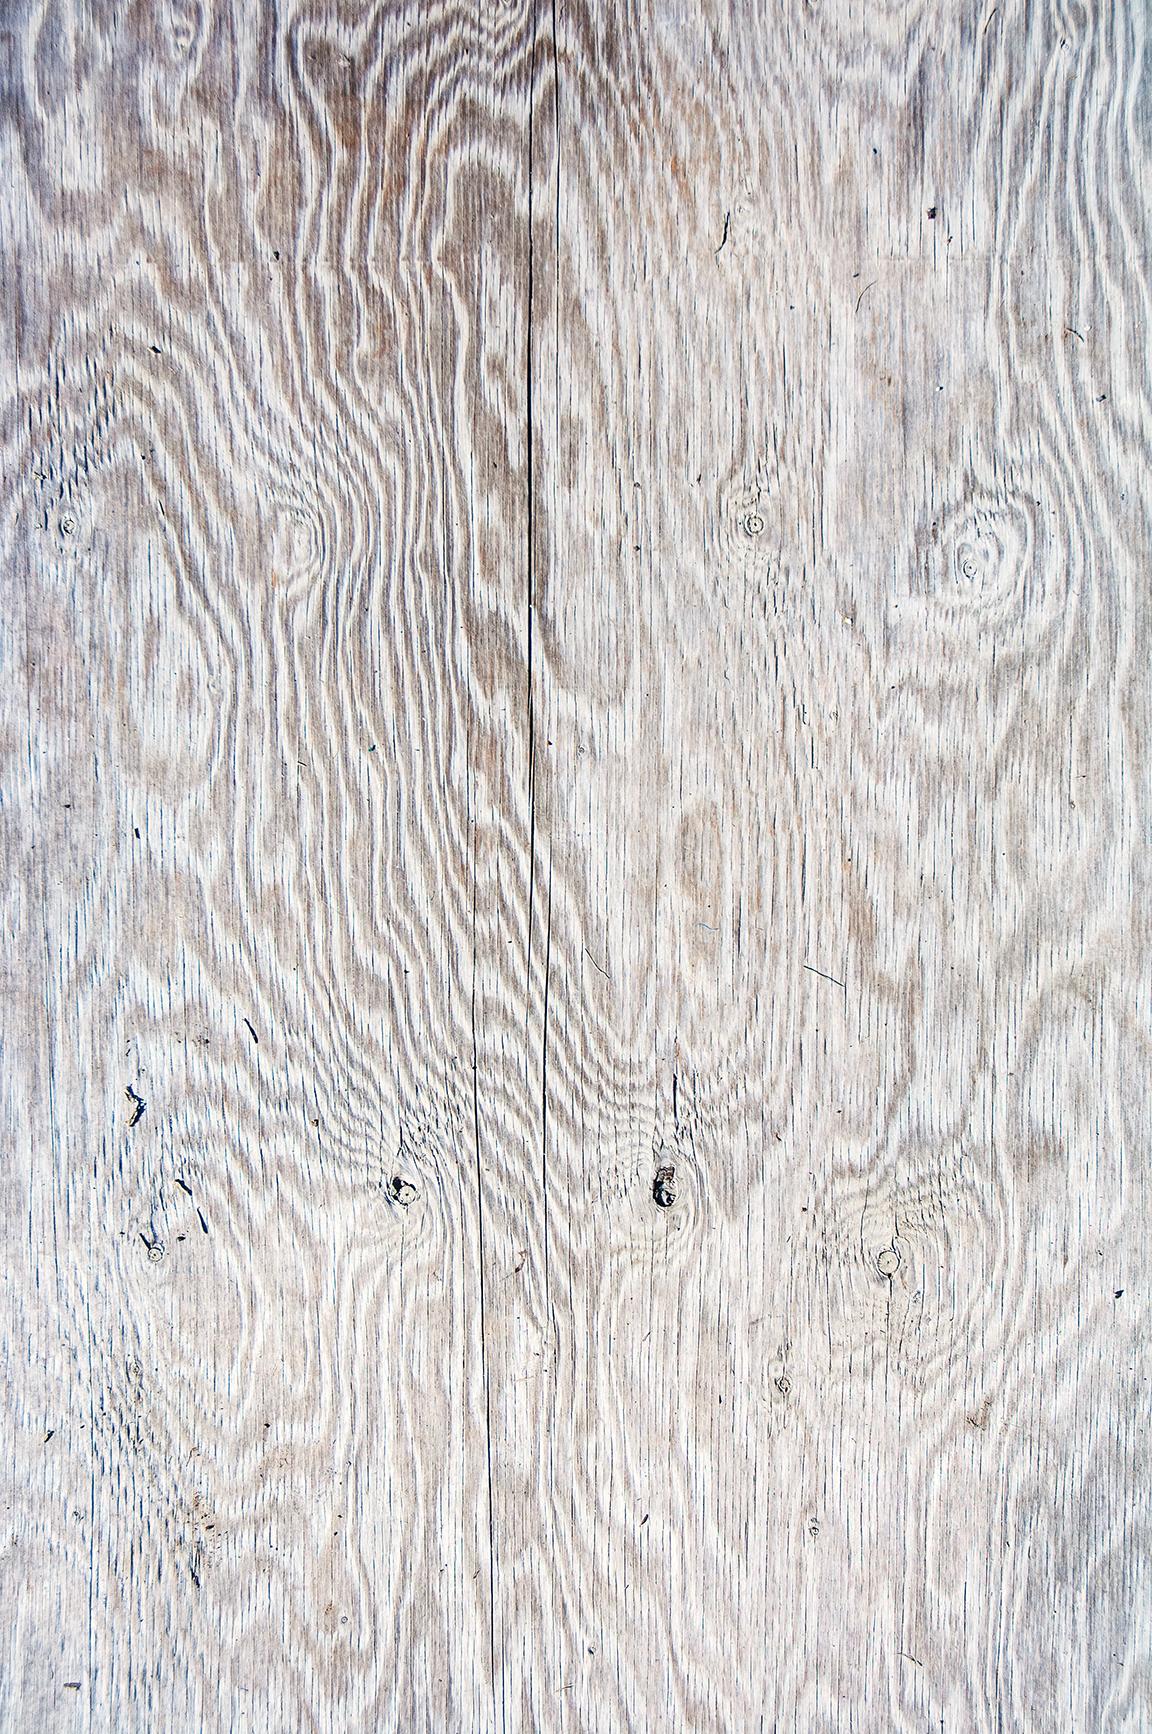 Plywood#6.jpg